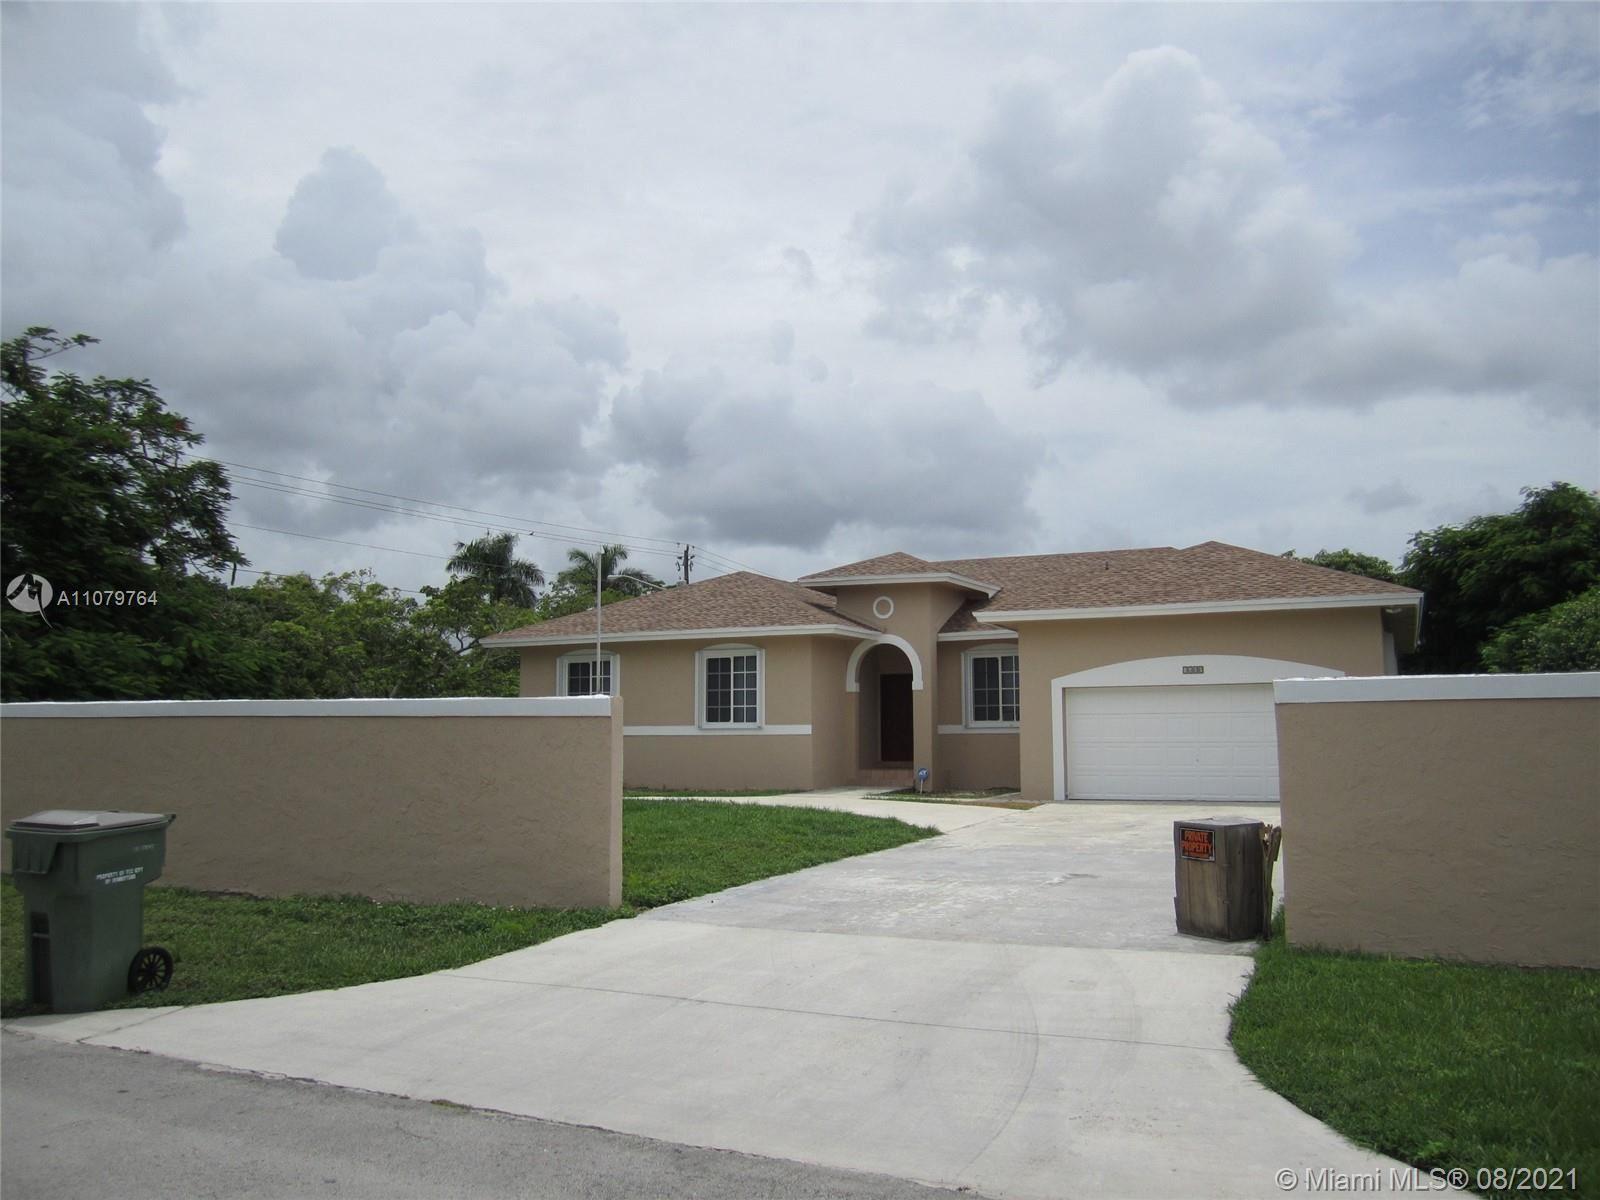 1400 NW 19th St, Homestead, FL 33030 - #: A11079764